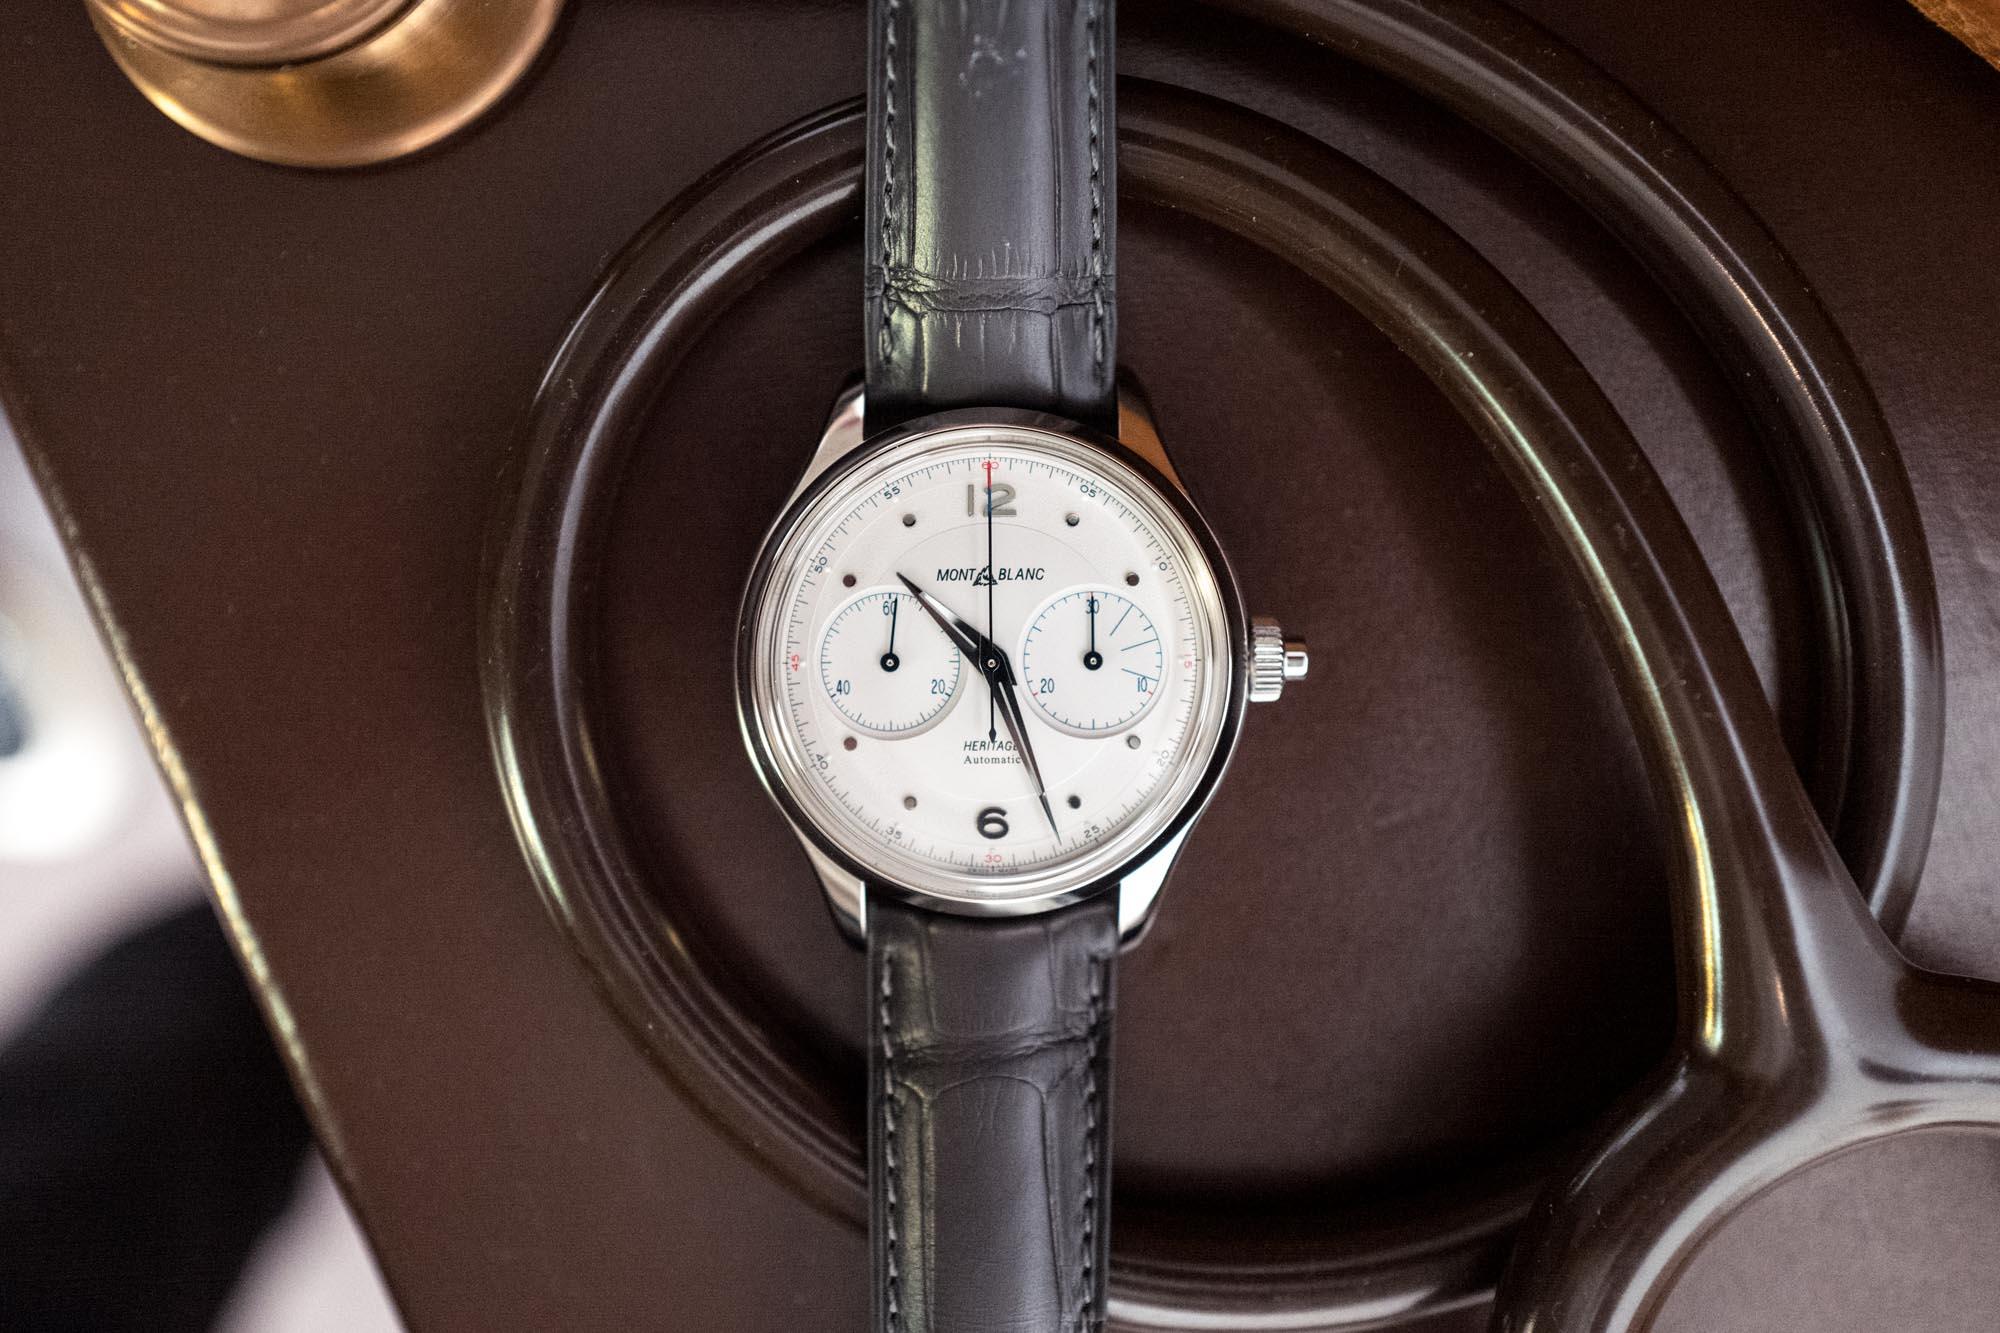 SIHH 2019 - Montblanc Heritage Monopusher Chronograph